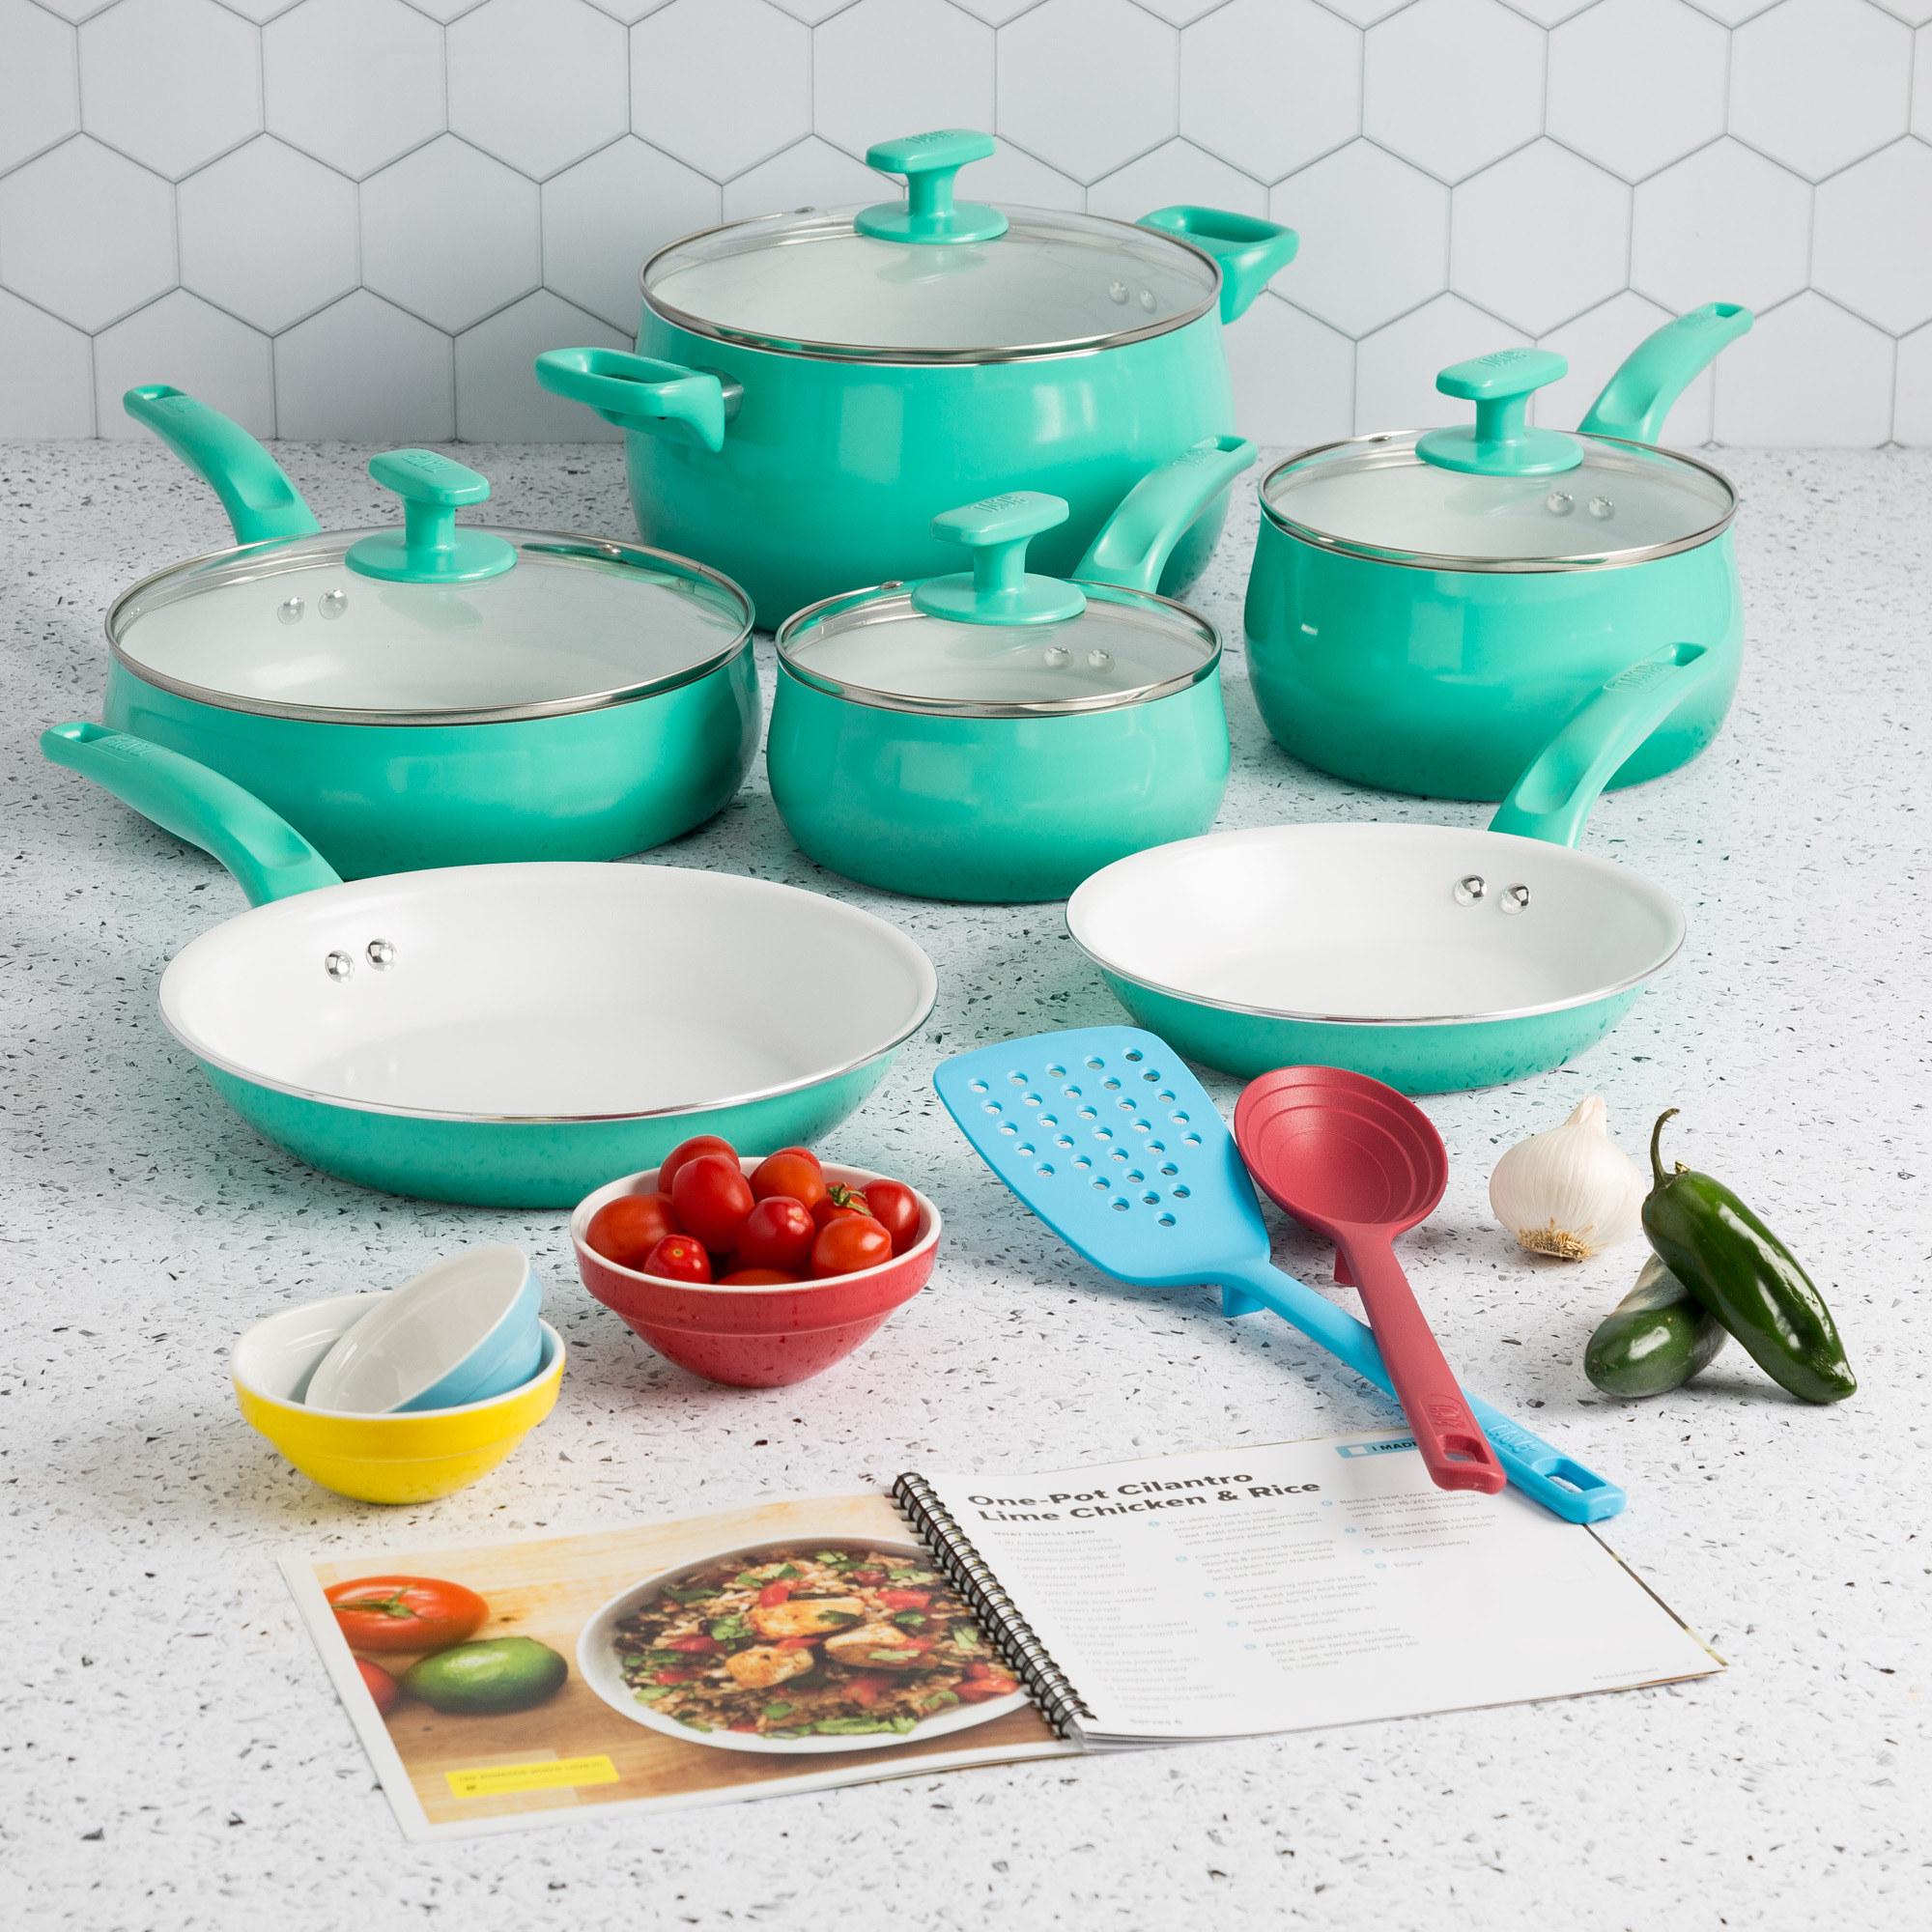 The cookware set in aqua